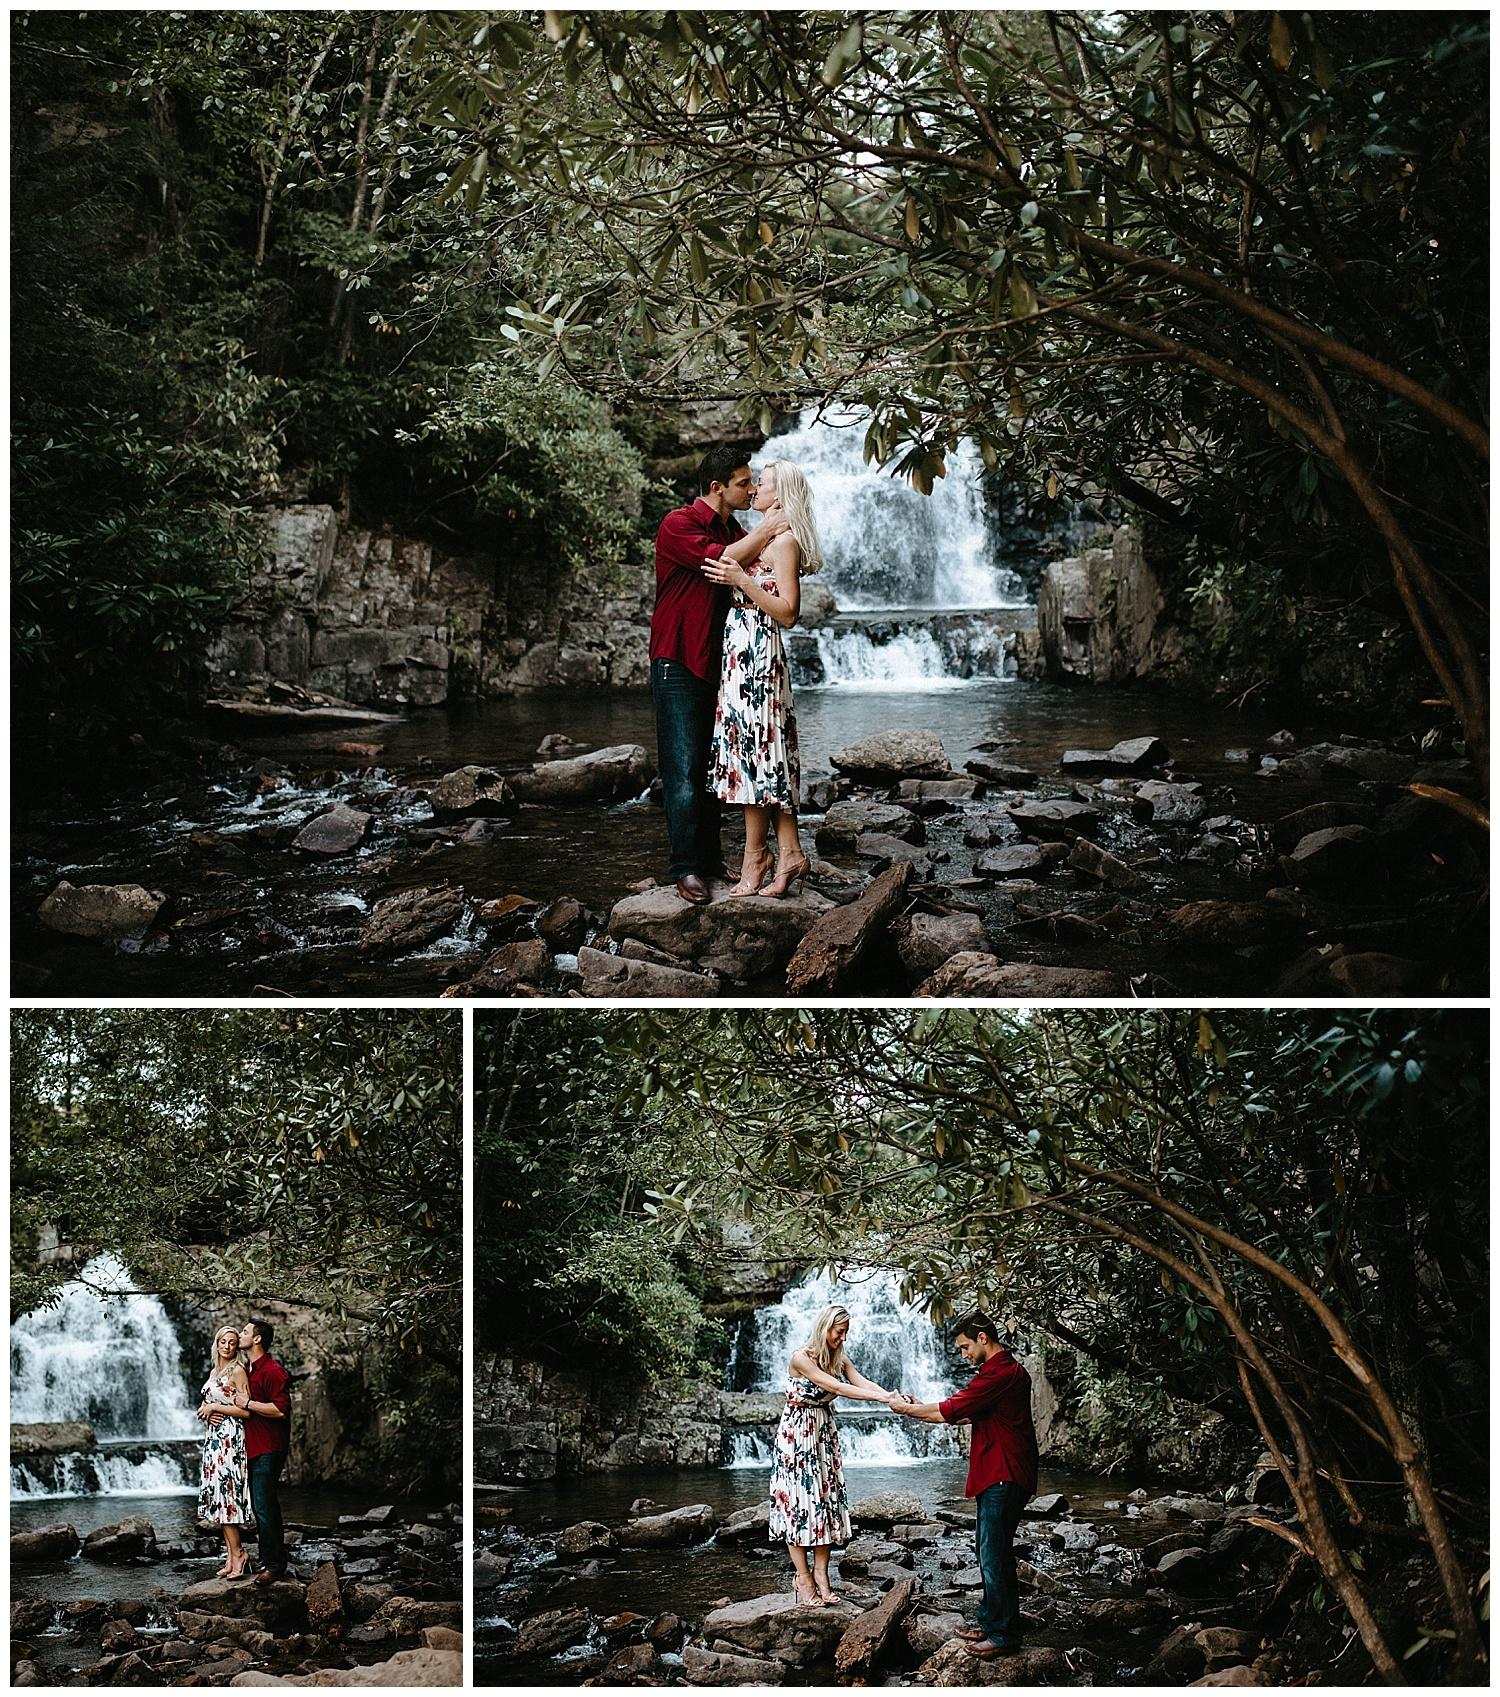 NEPA-Wedding-Engagement-Photographer-at-Hickory-Run-state-park_0005.jpg